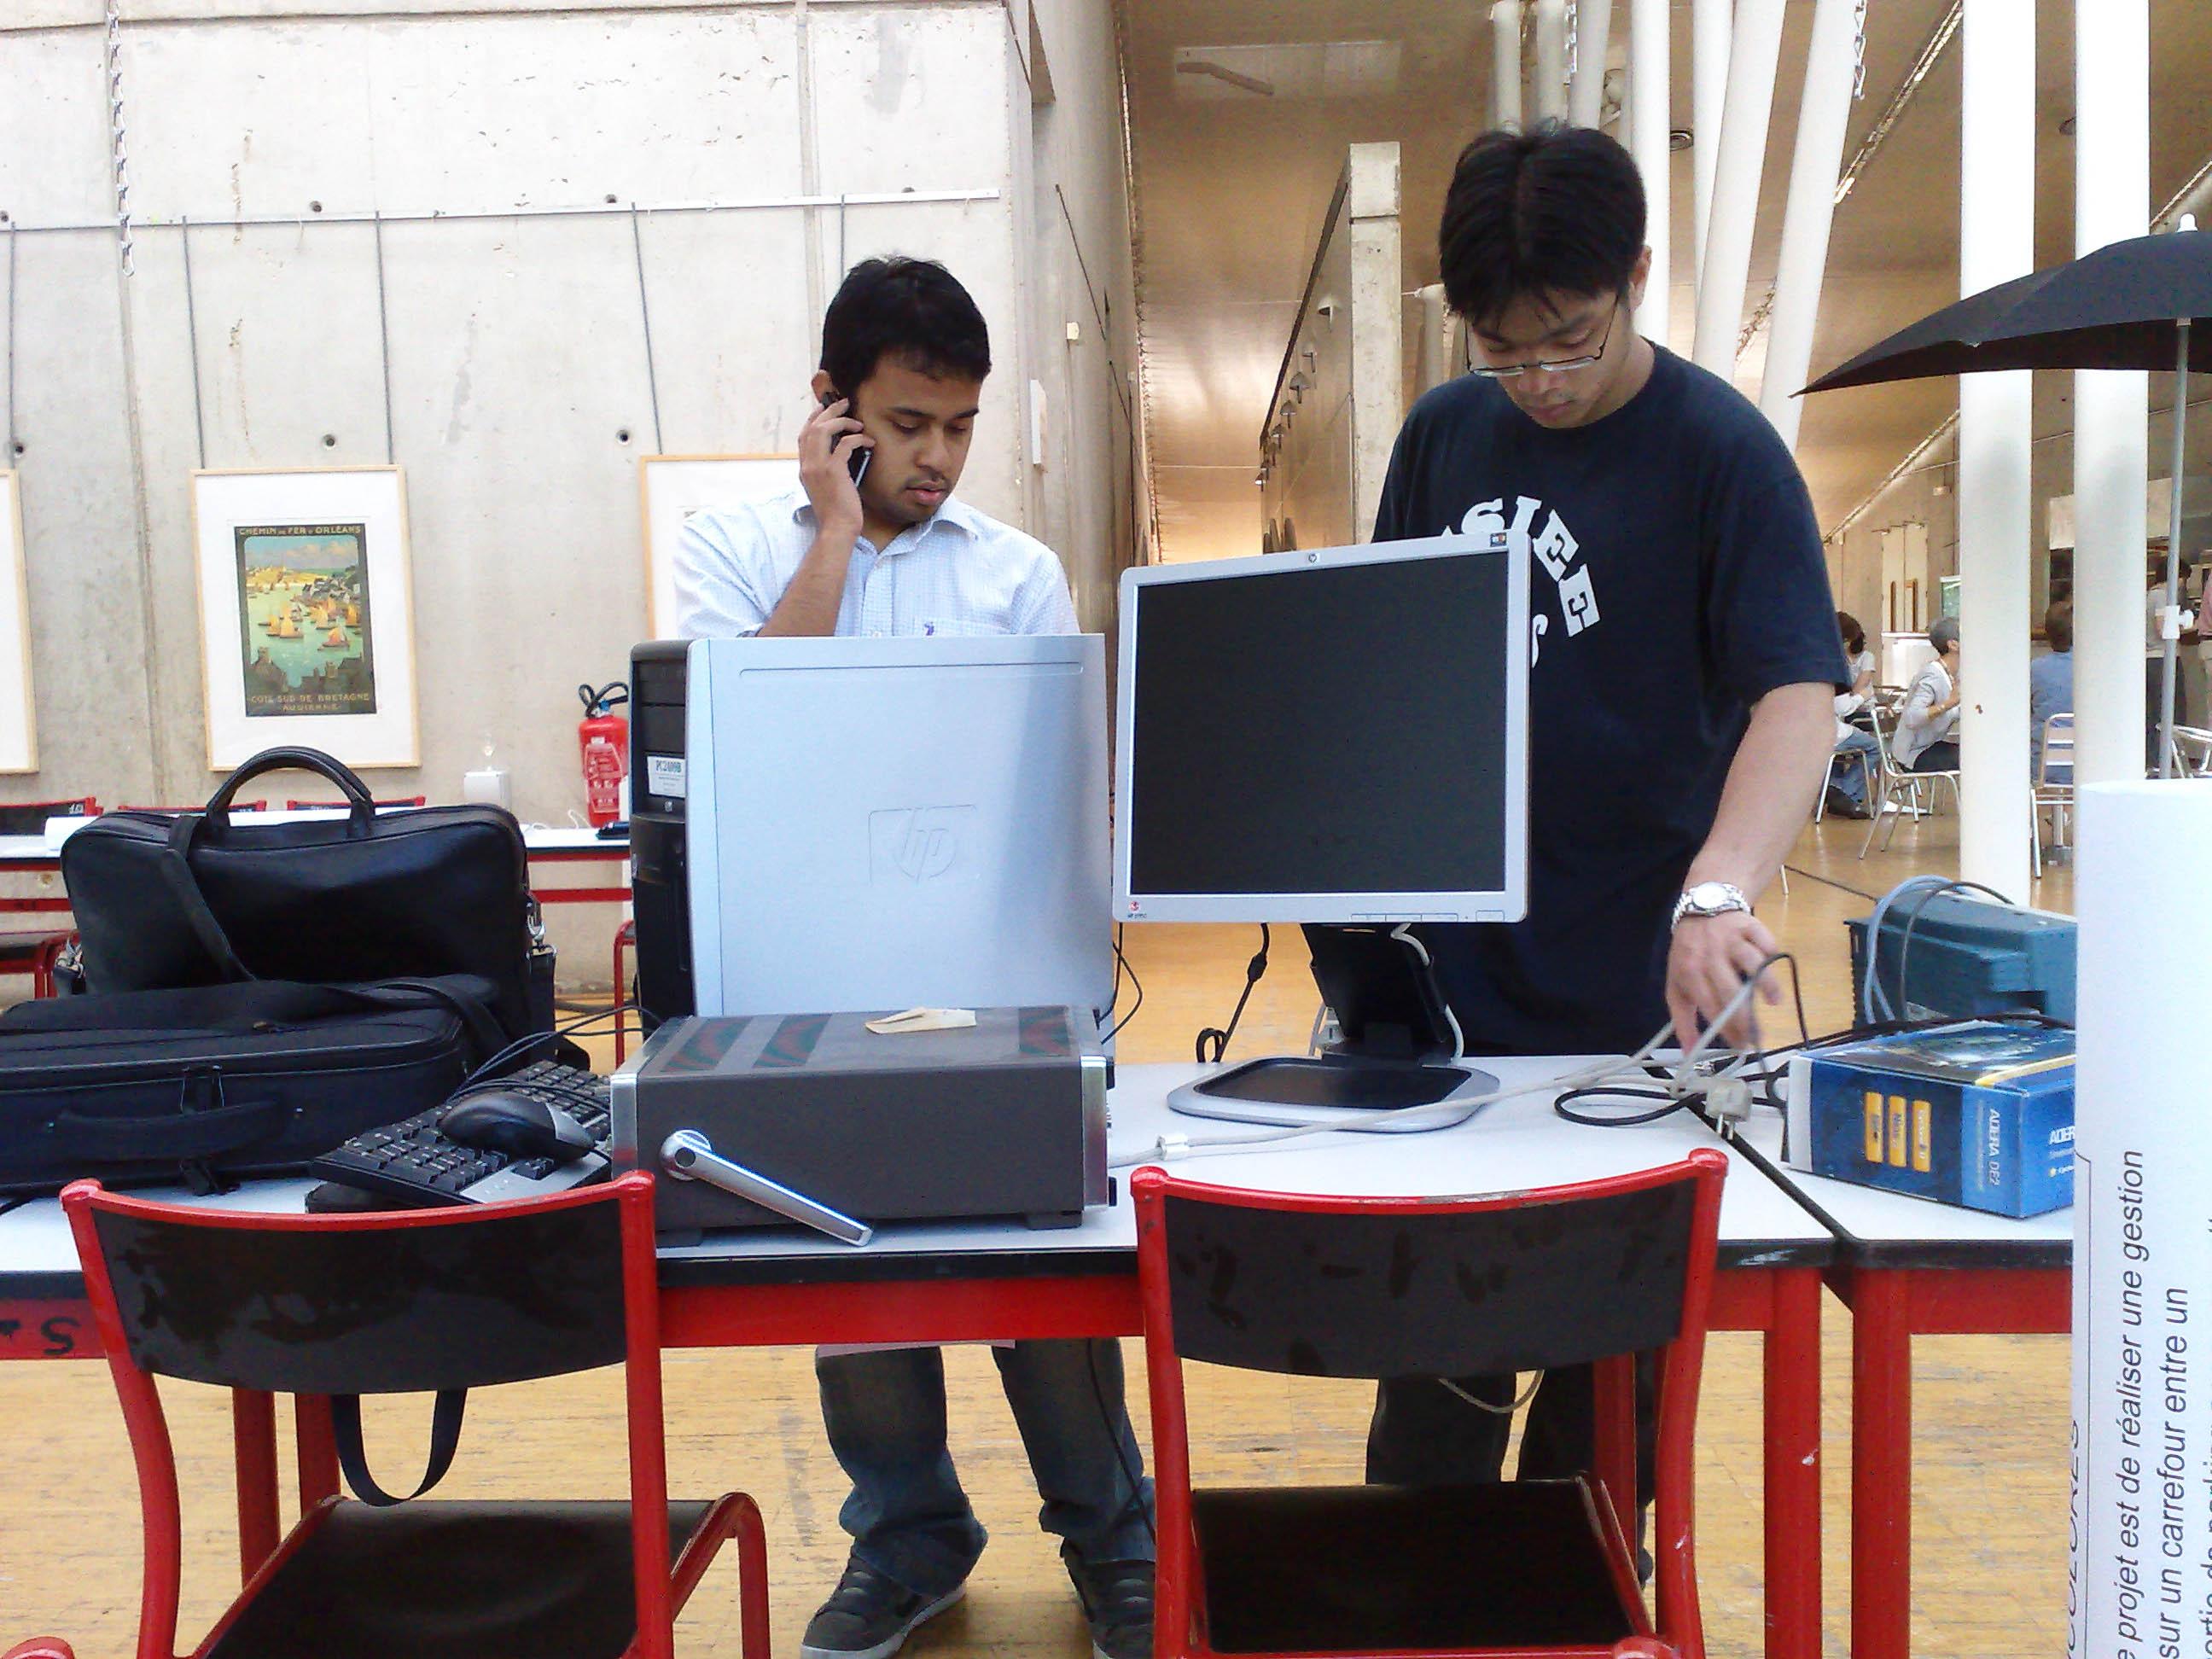 Telo 和 Quy-Nam 在准备器材